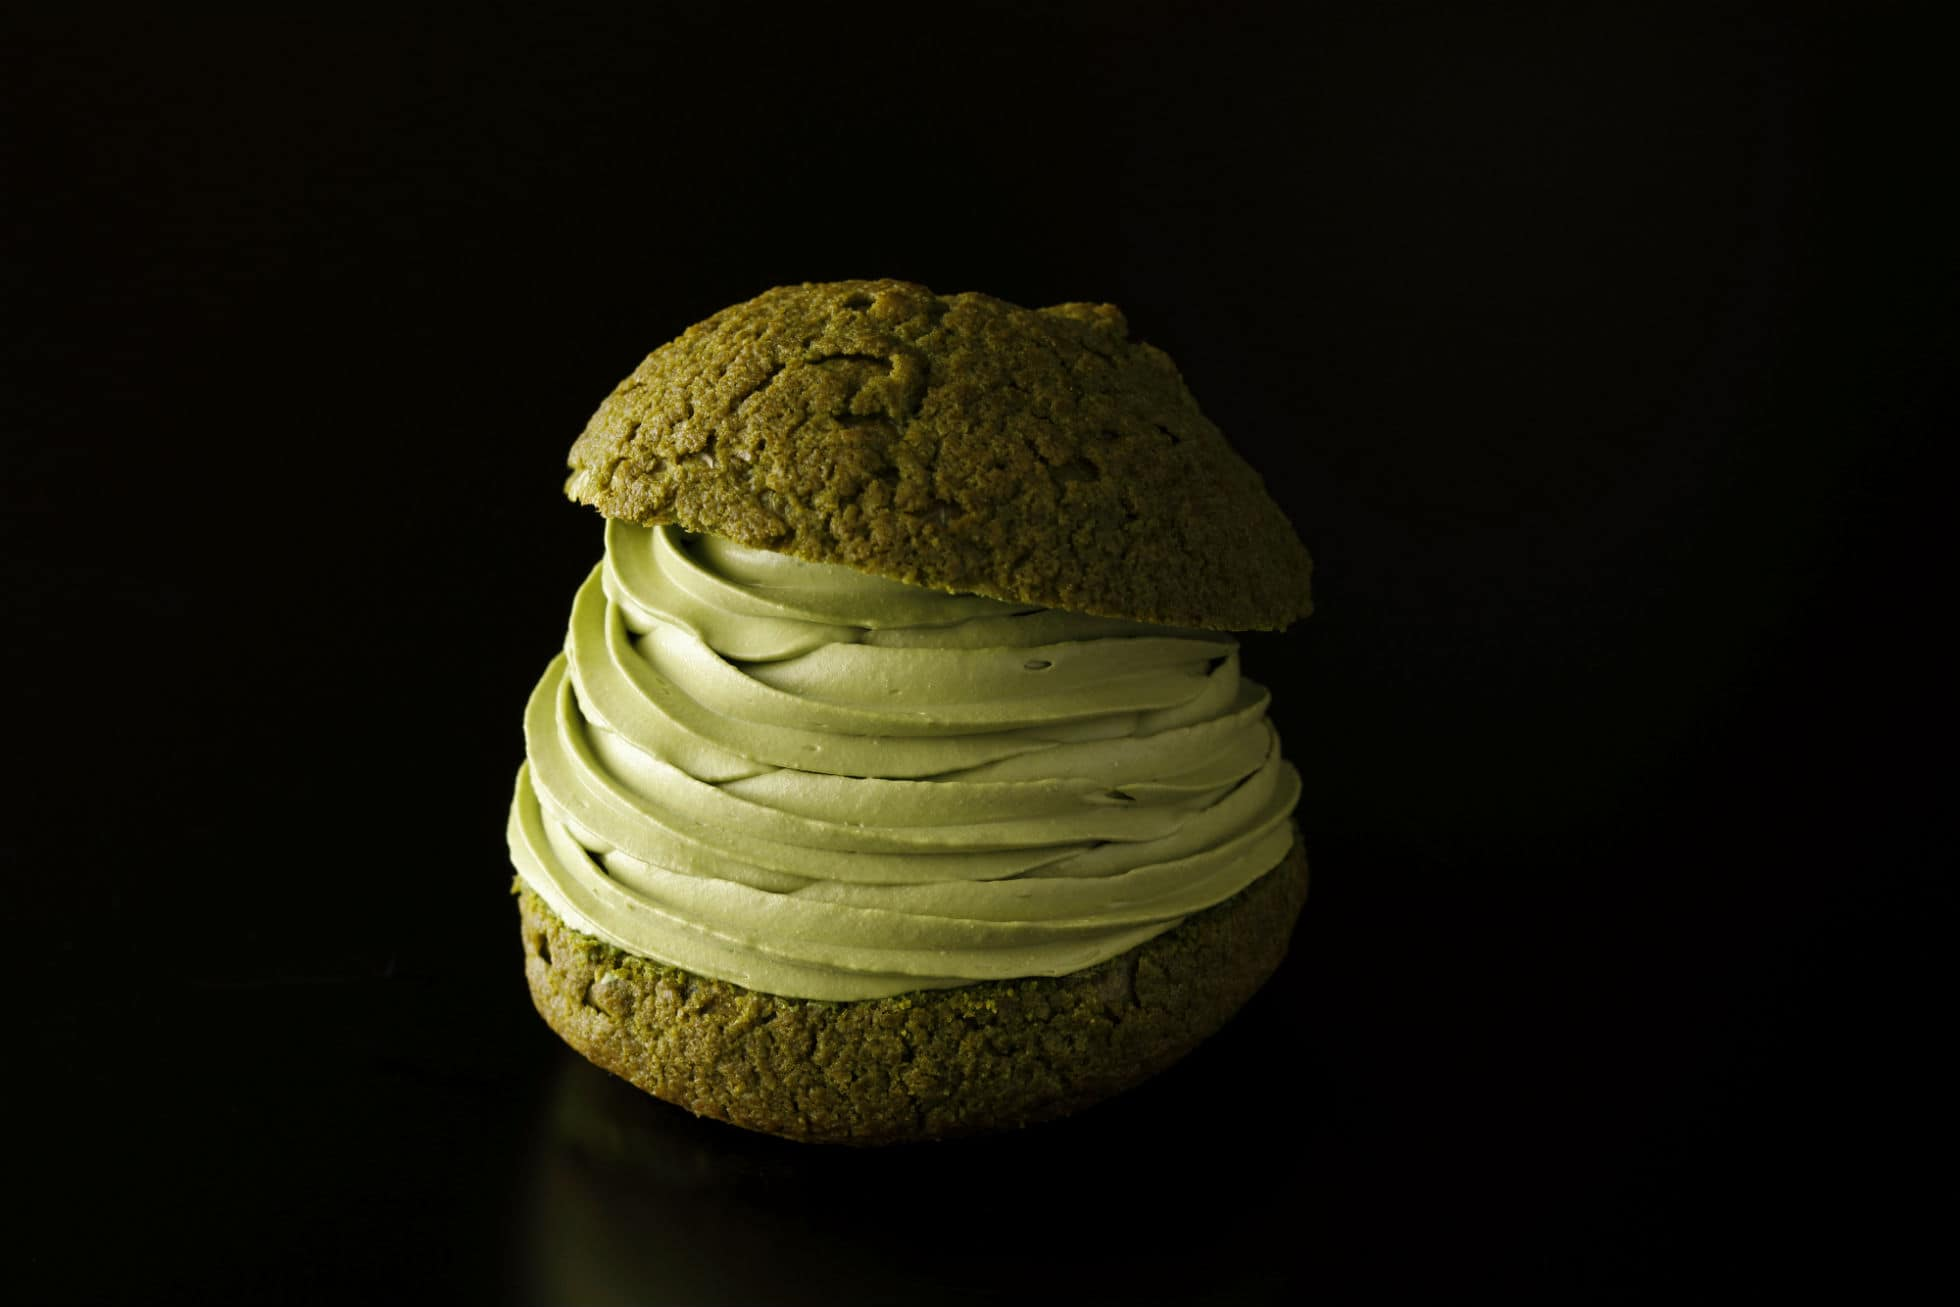 Shin Edo Matcha Shu Cream (1,000 เยน ไม่รวมภาษี)